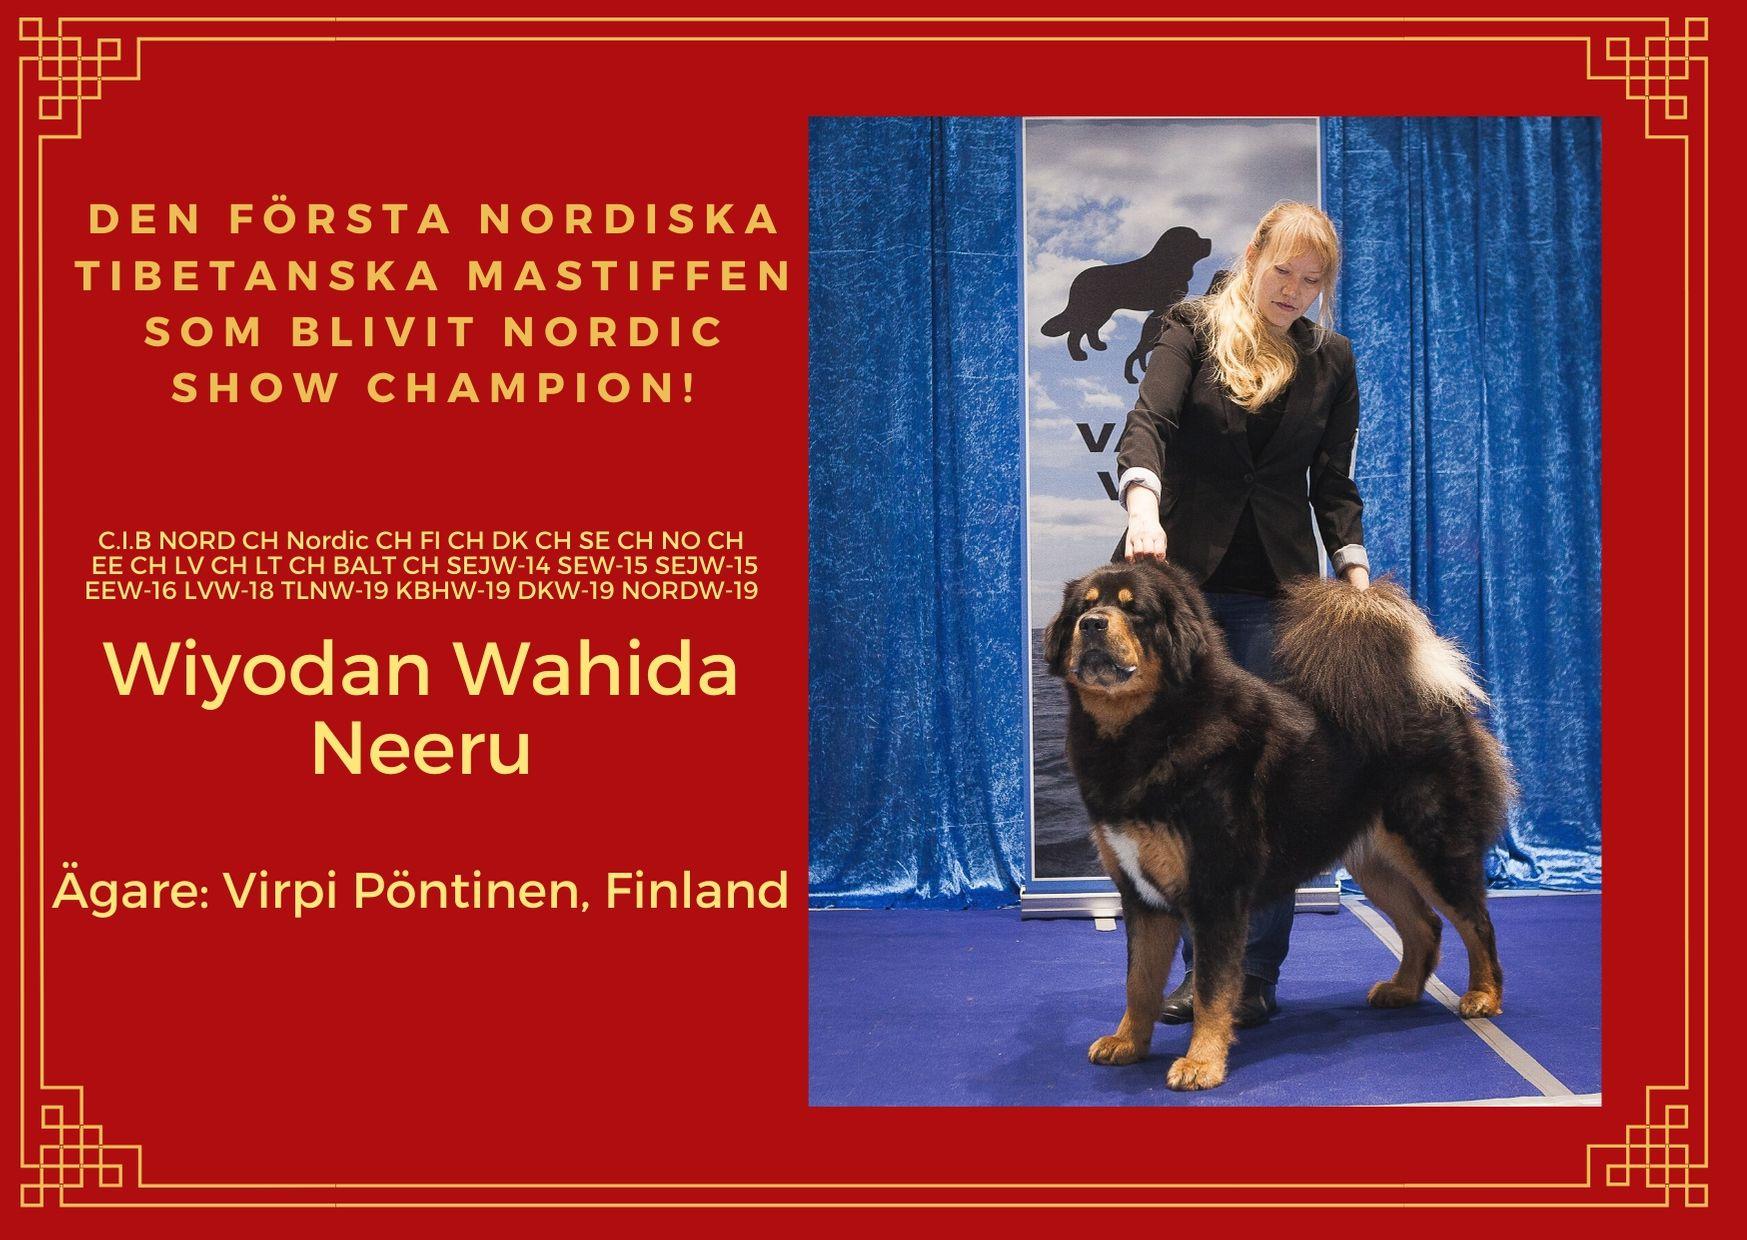 nordic show champion